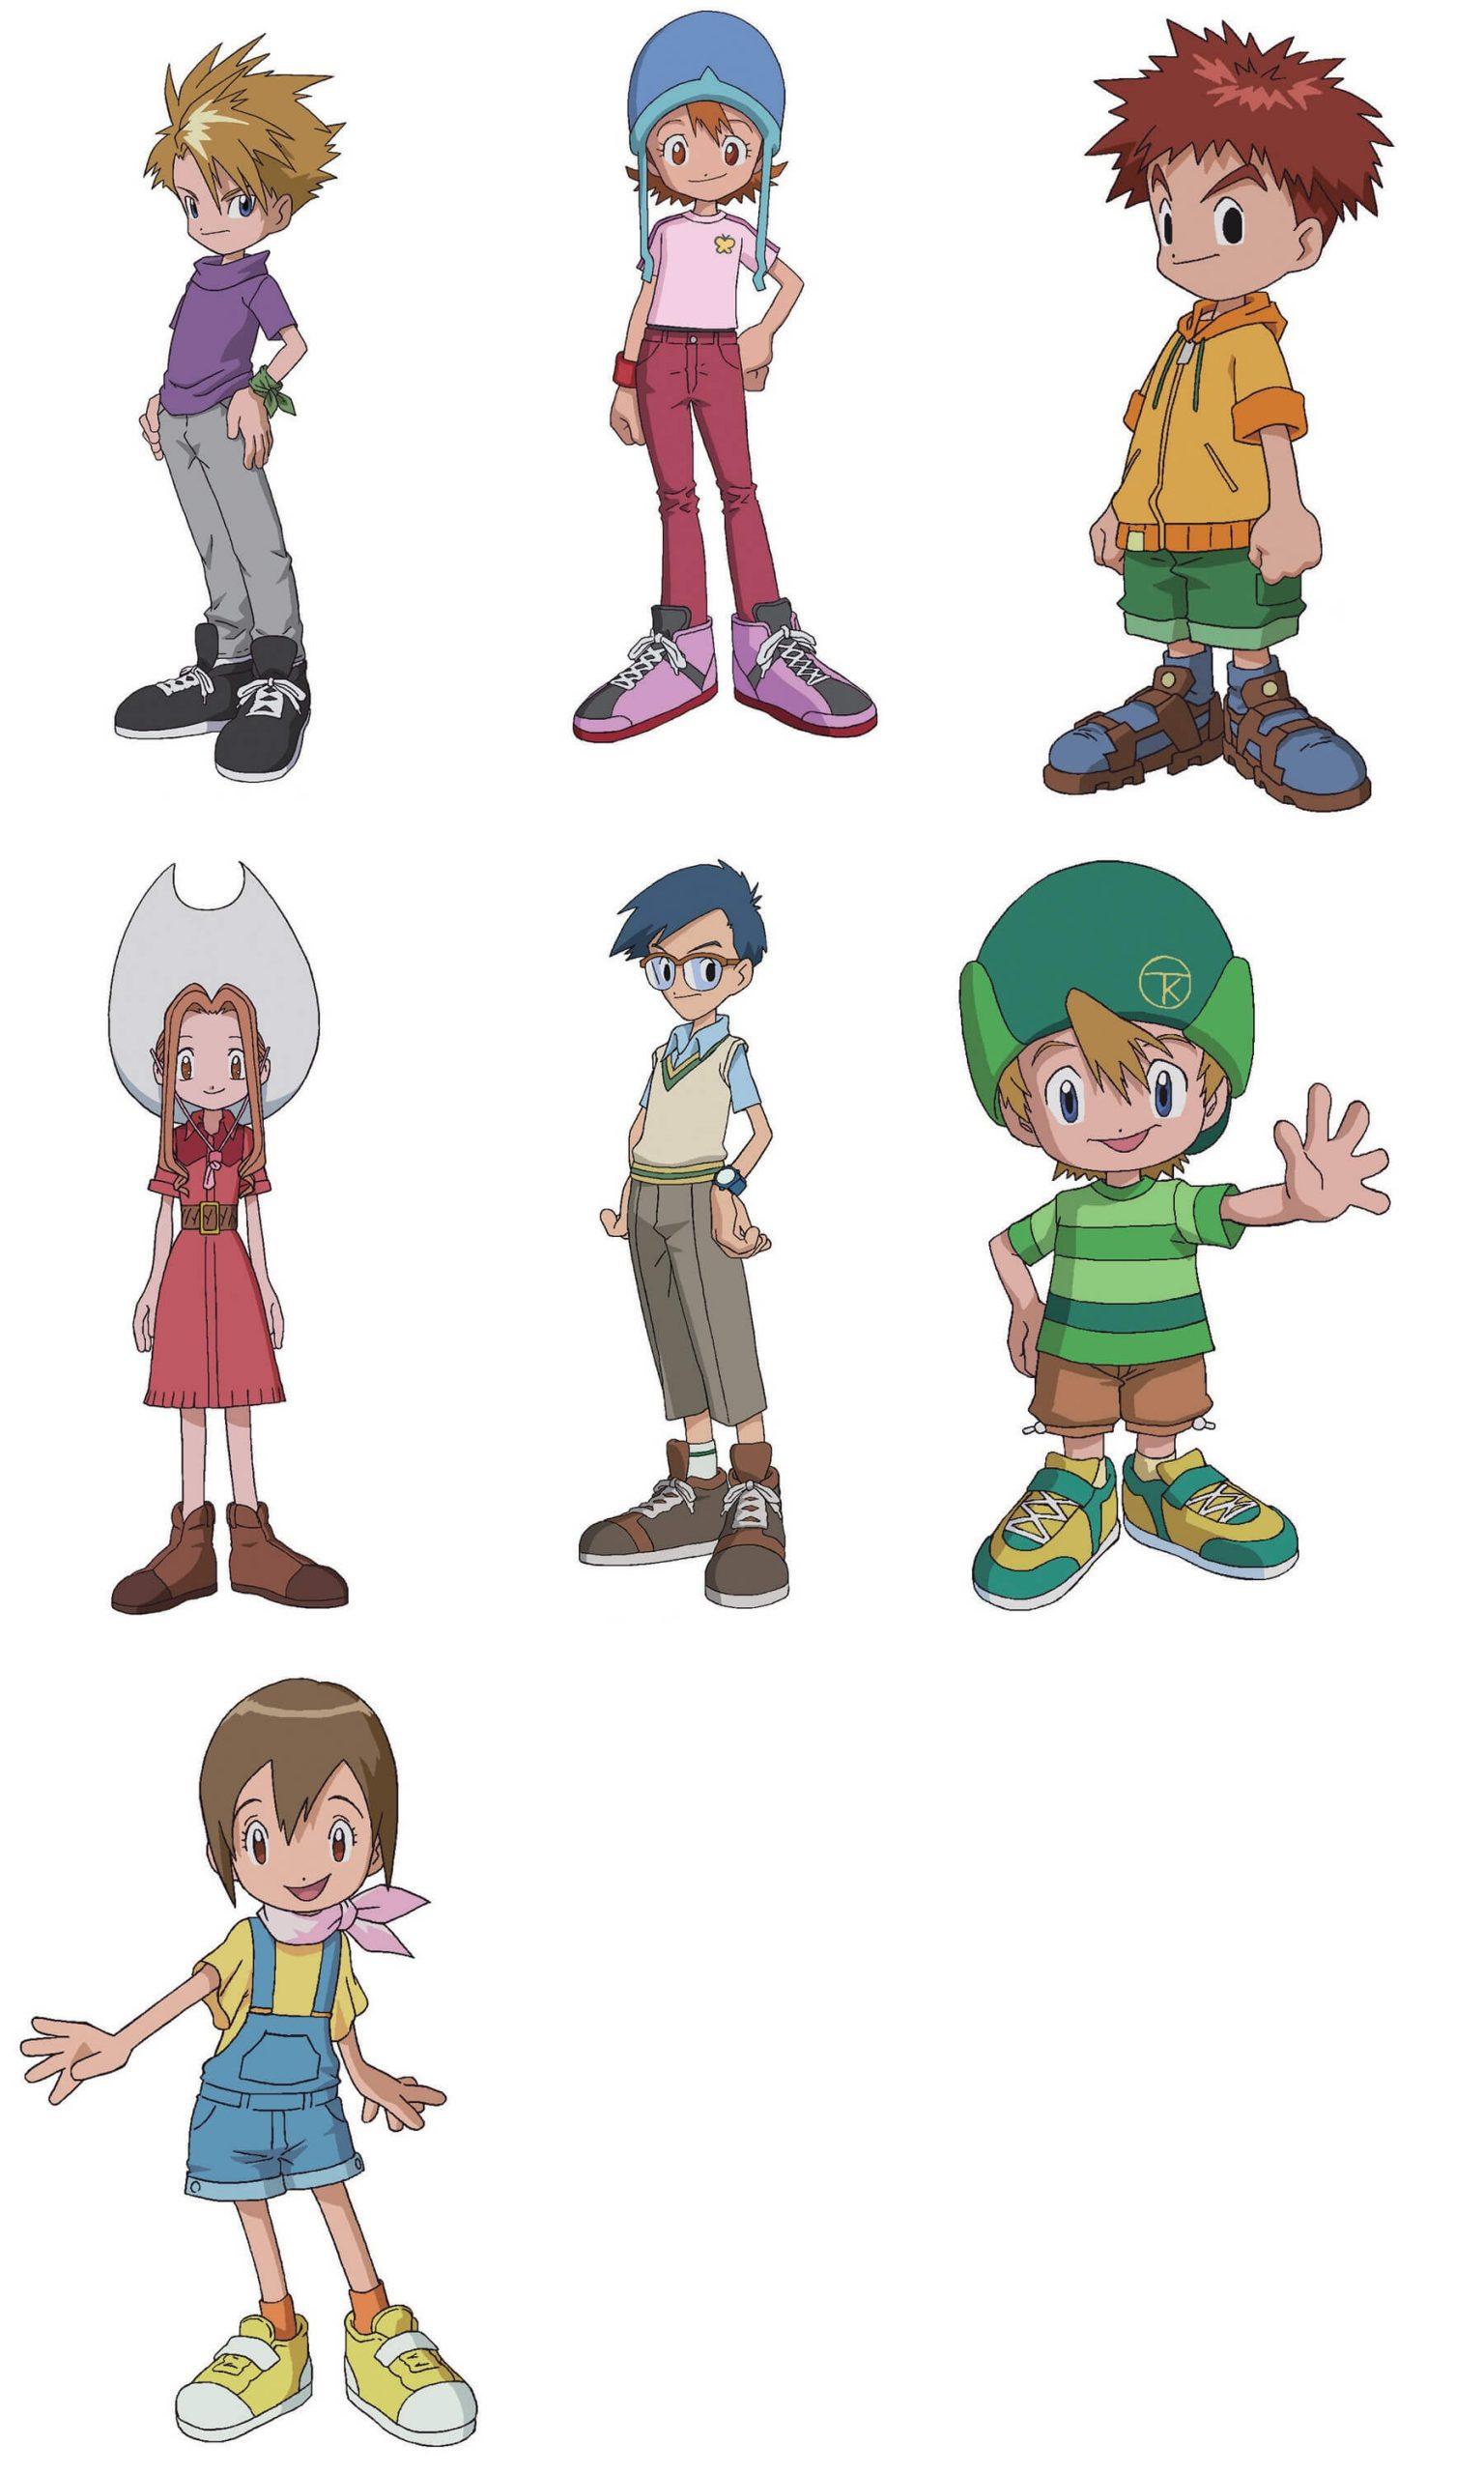 Digimon nuevo anime Crunchyroll personajes